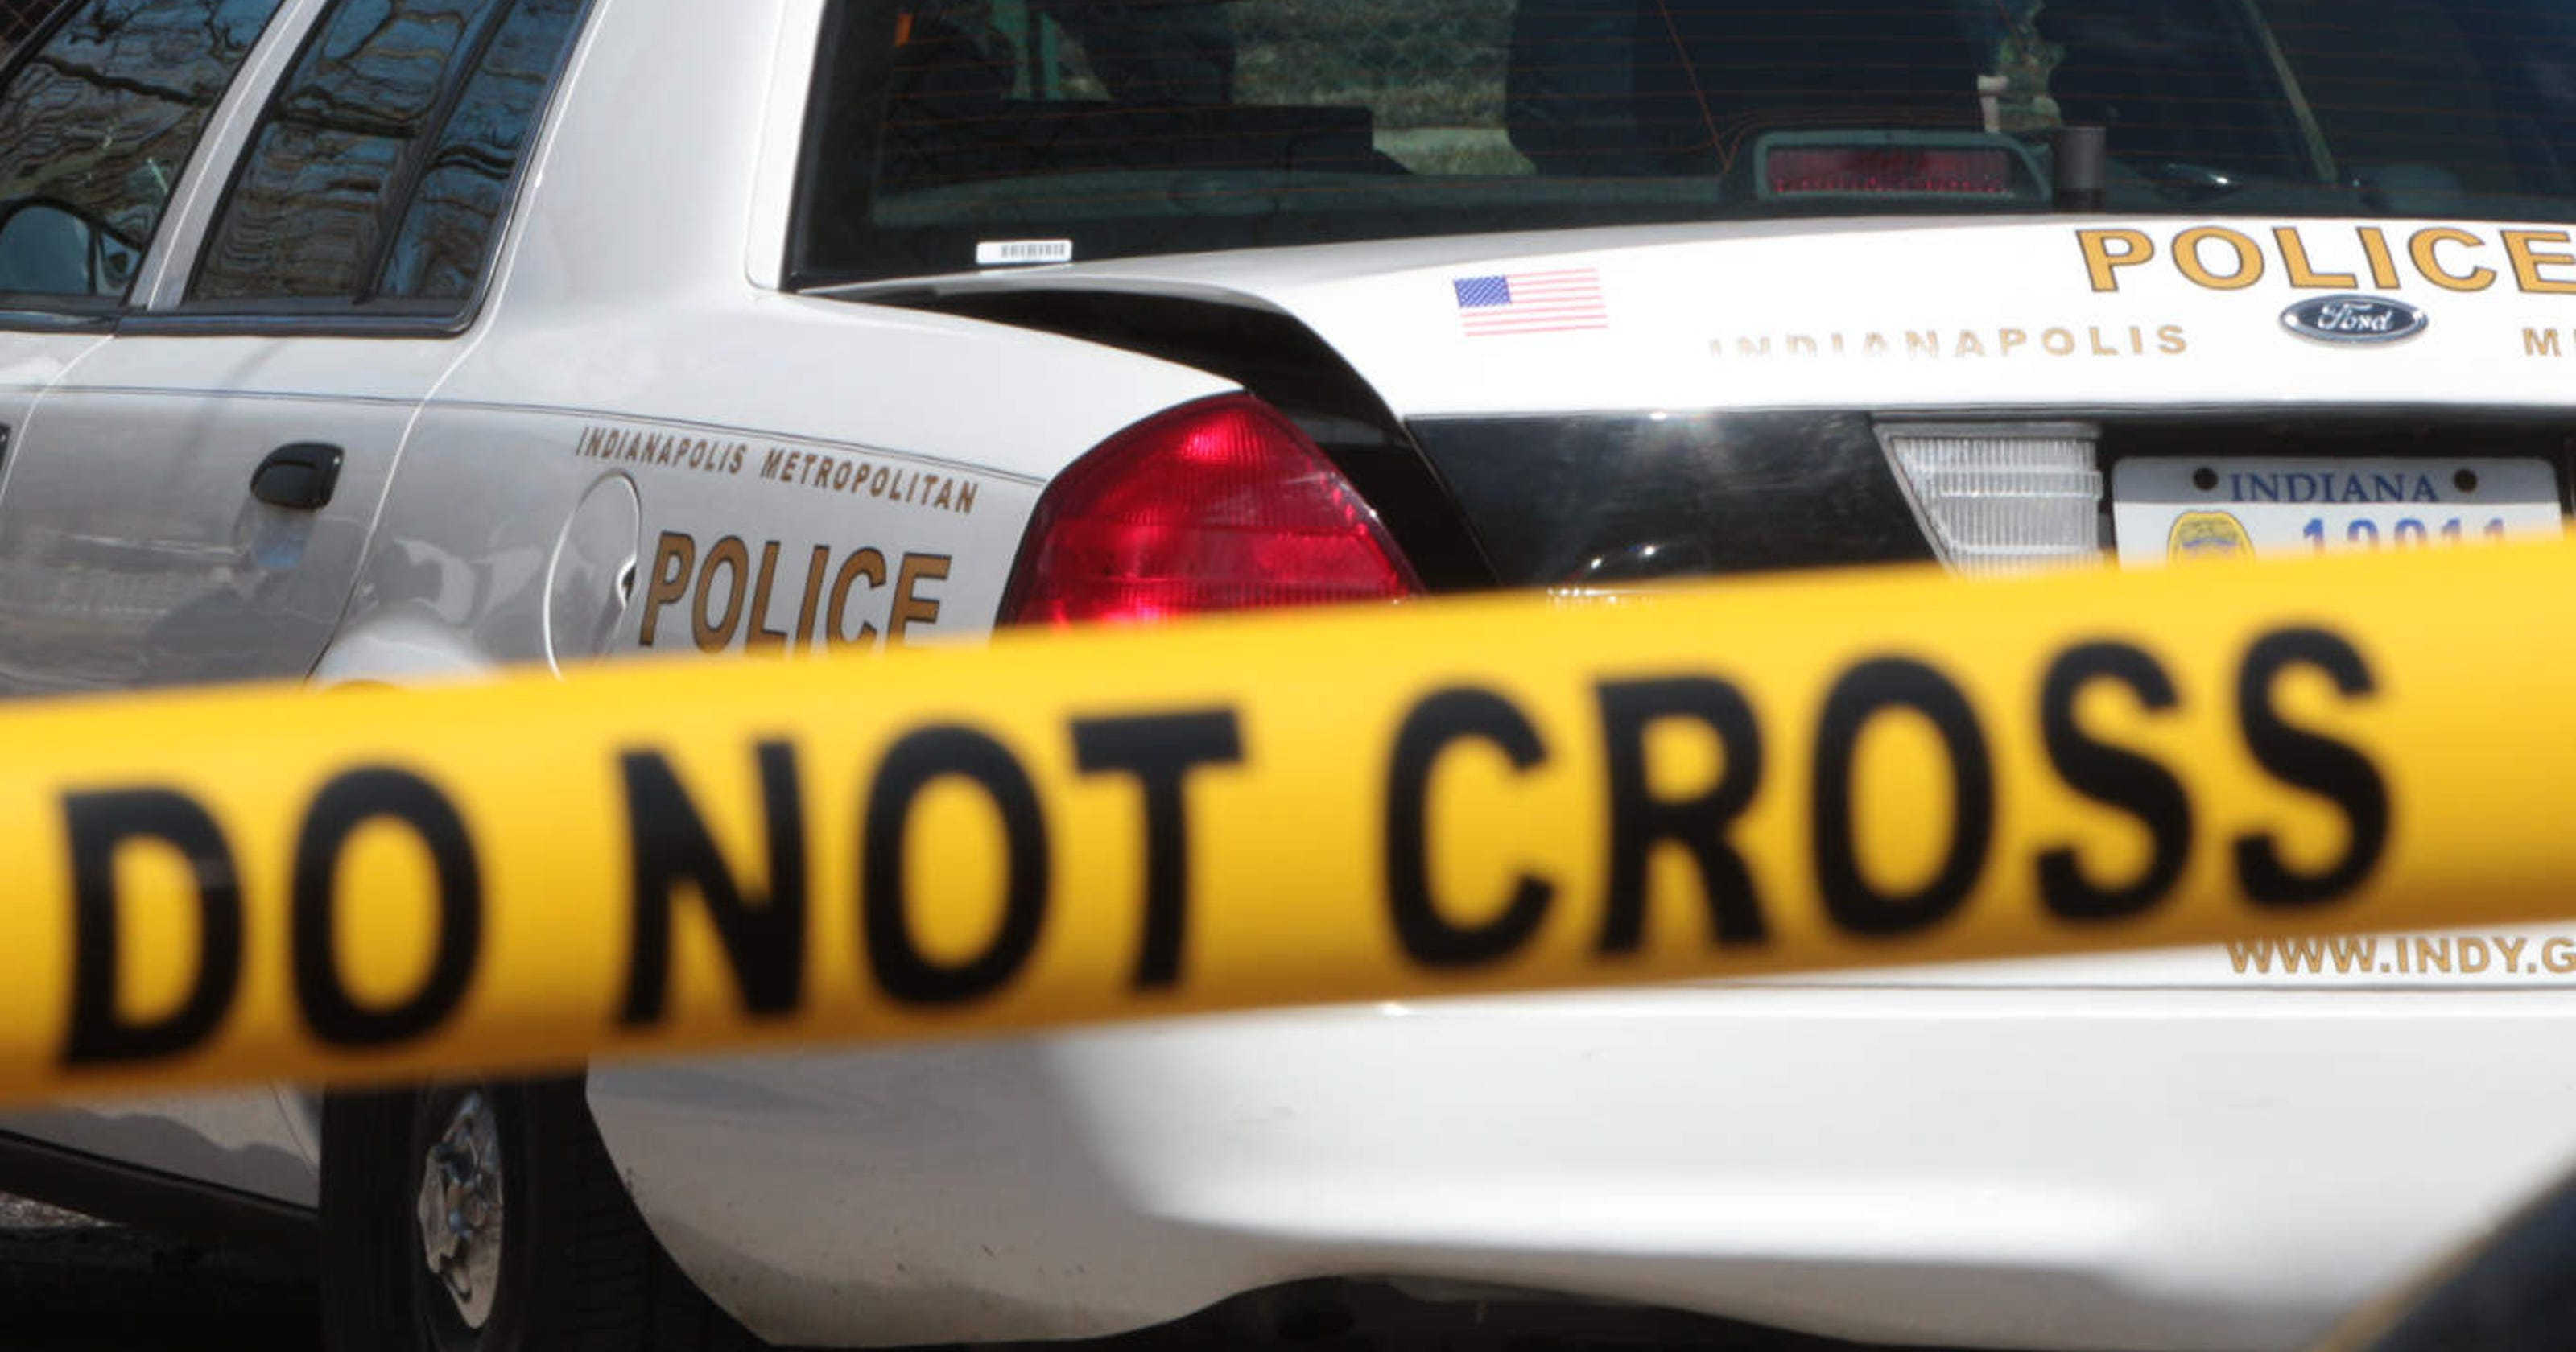 3 women attacked downtown 2 in garage solutioingenieria Choice Image